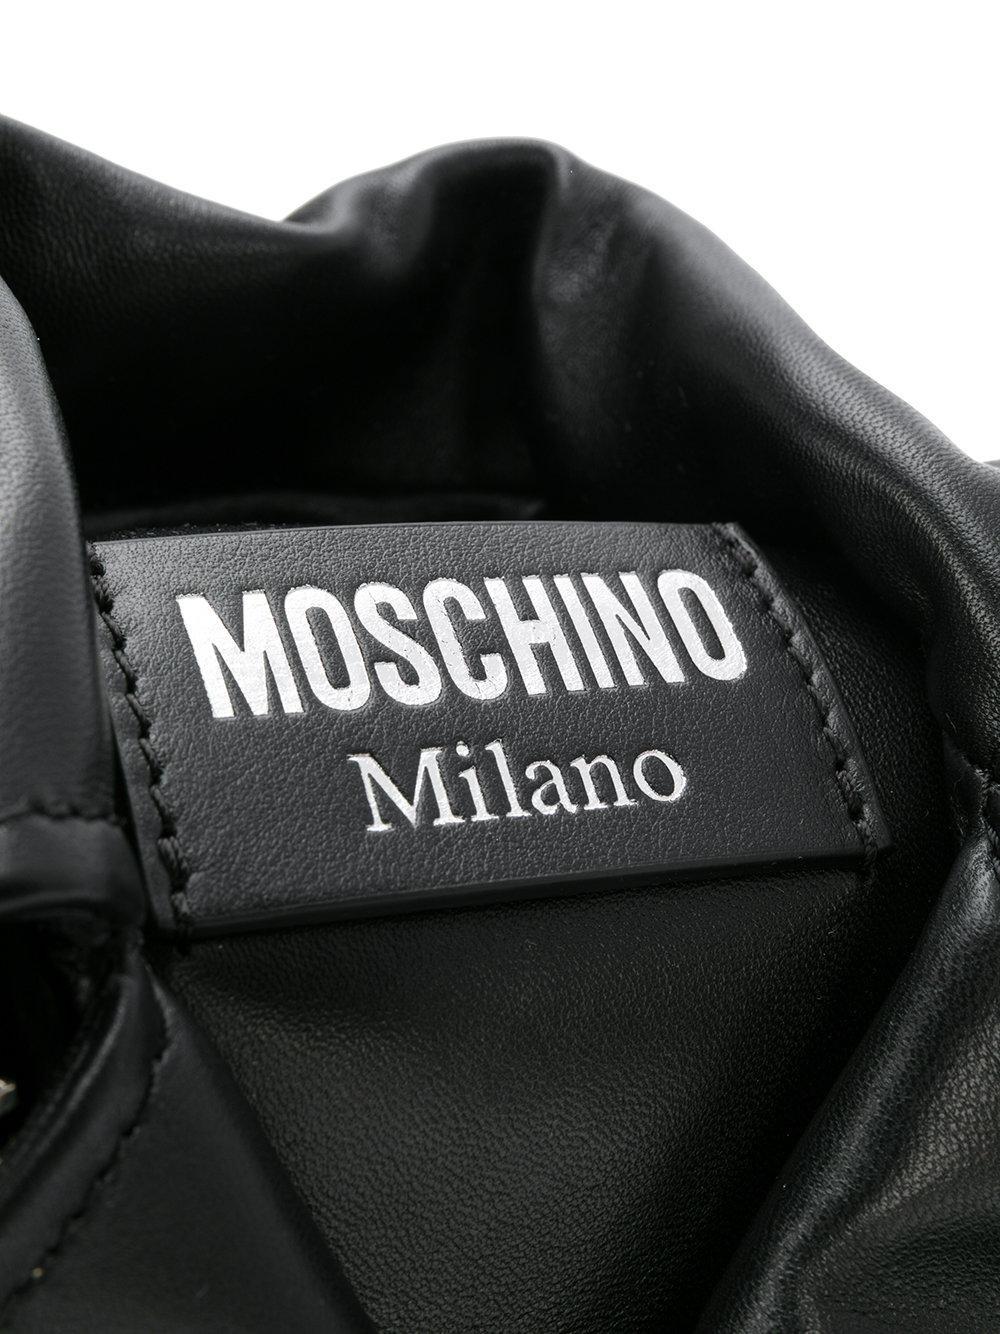 Moschino Leather Bow Biker Jacket Cross Body Bag in Black